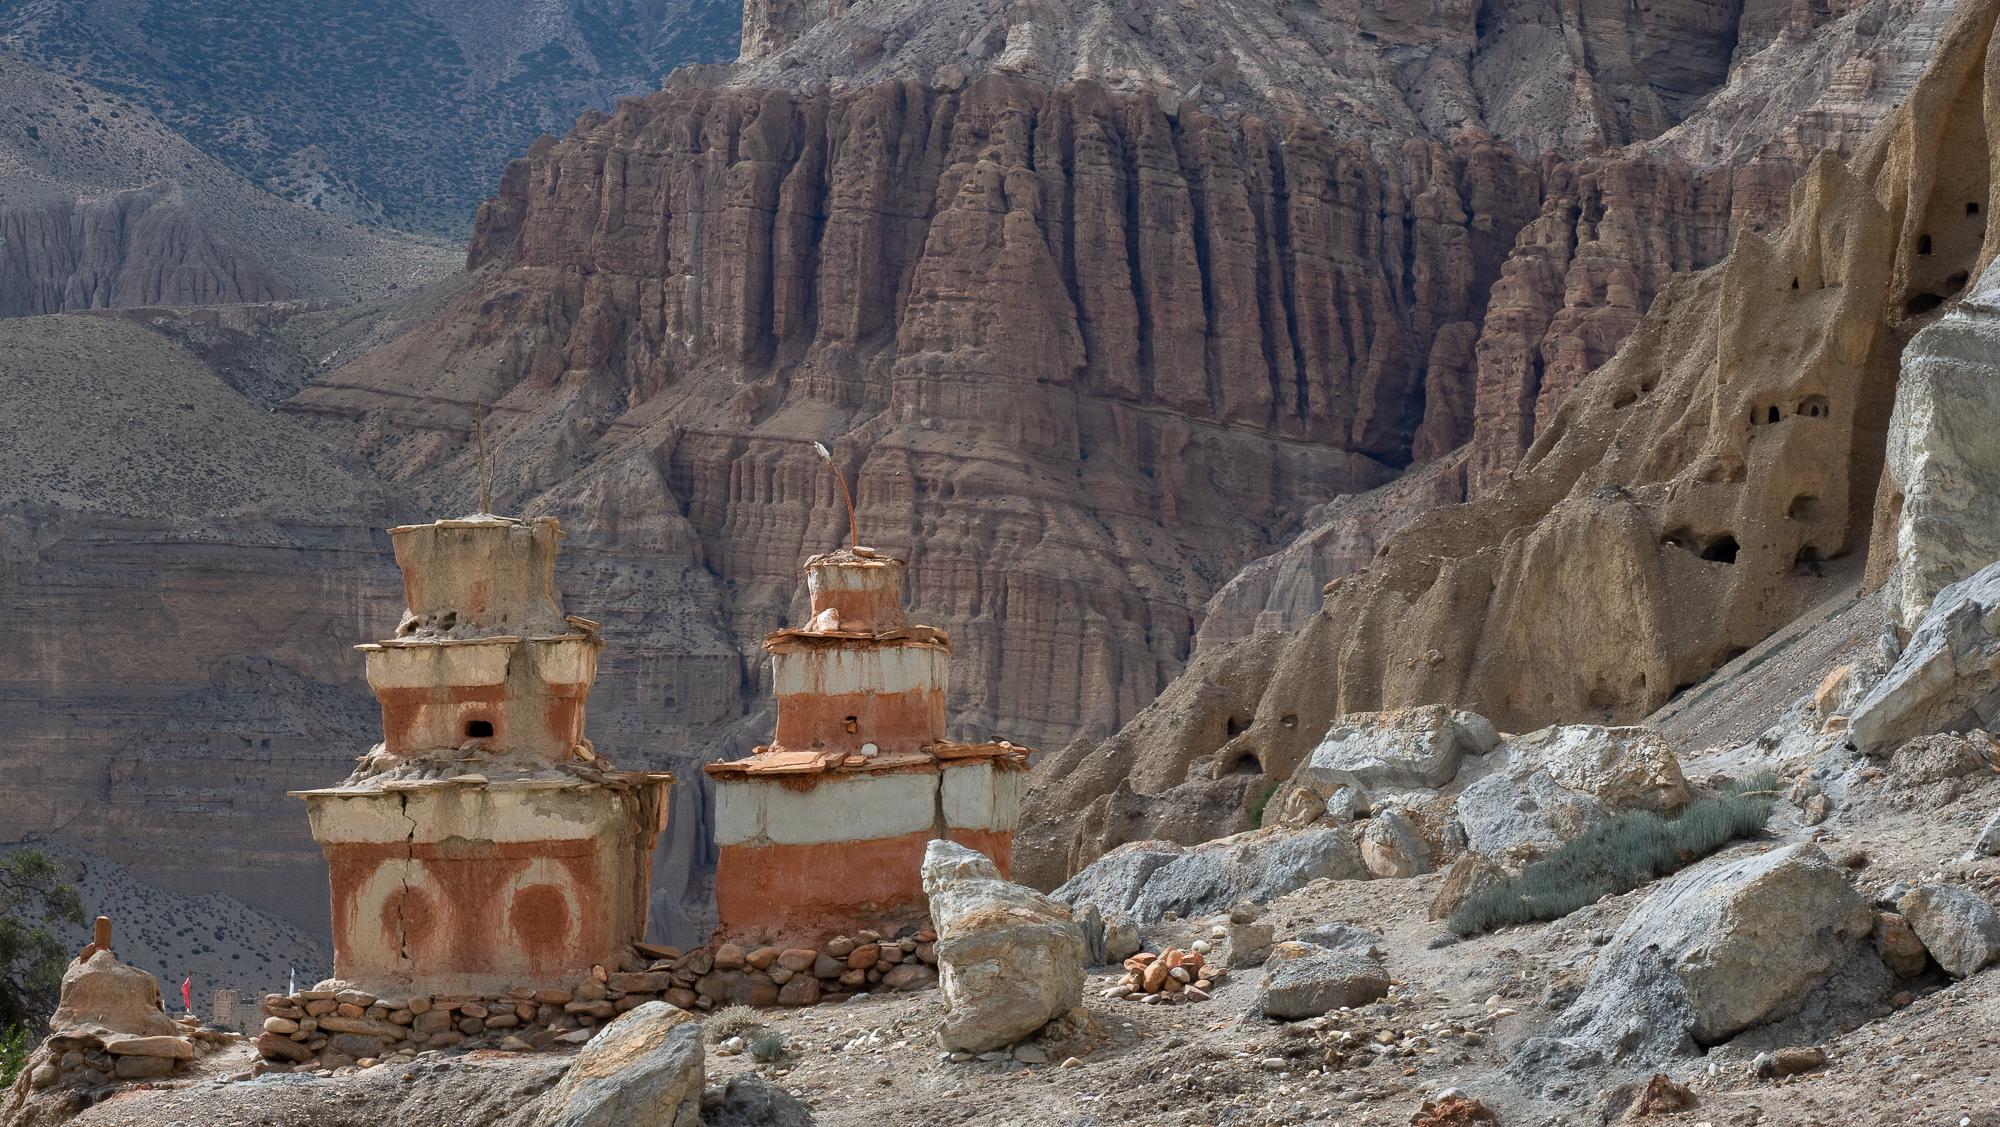 chhusang stupas, Nepal